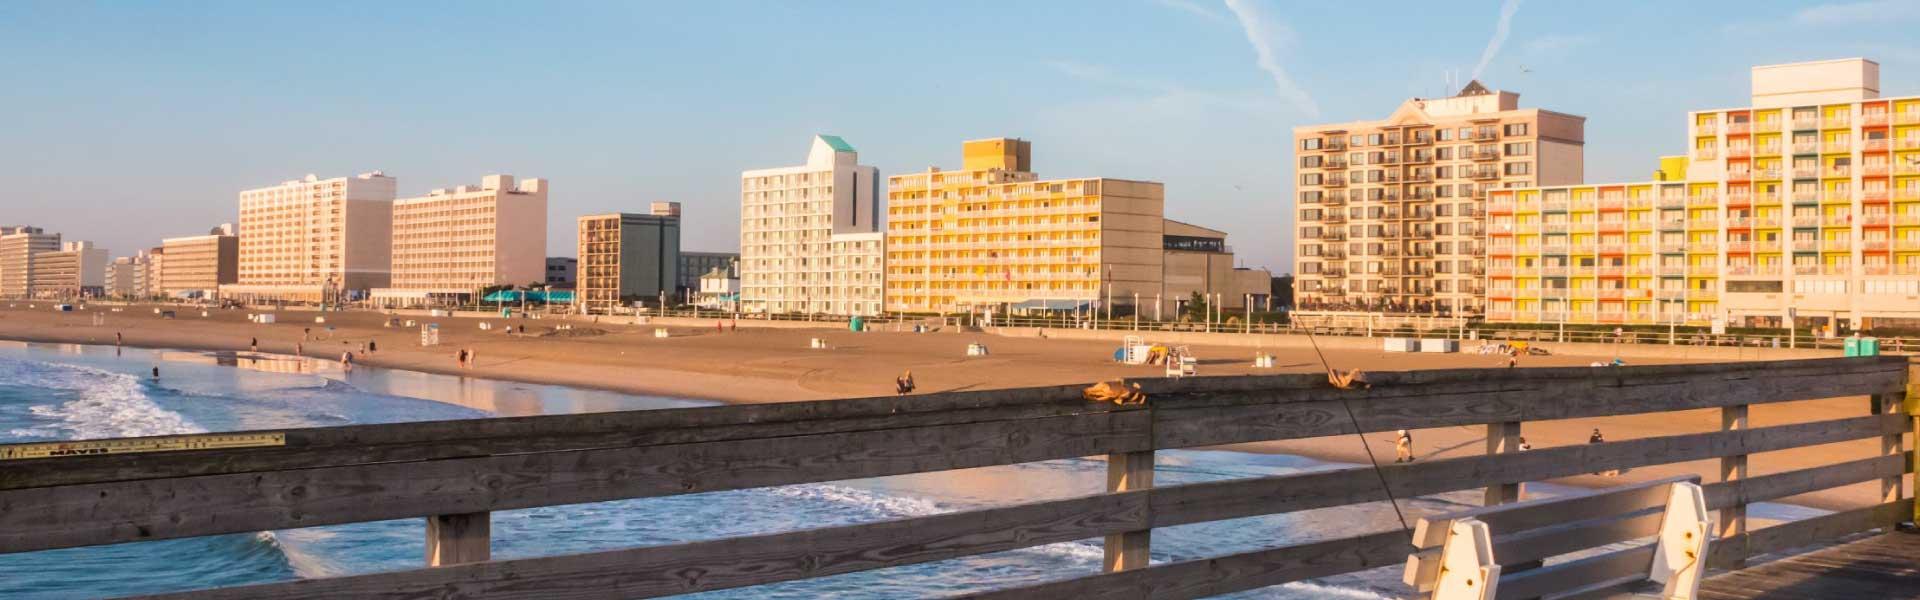 Virginia Beach development